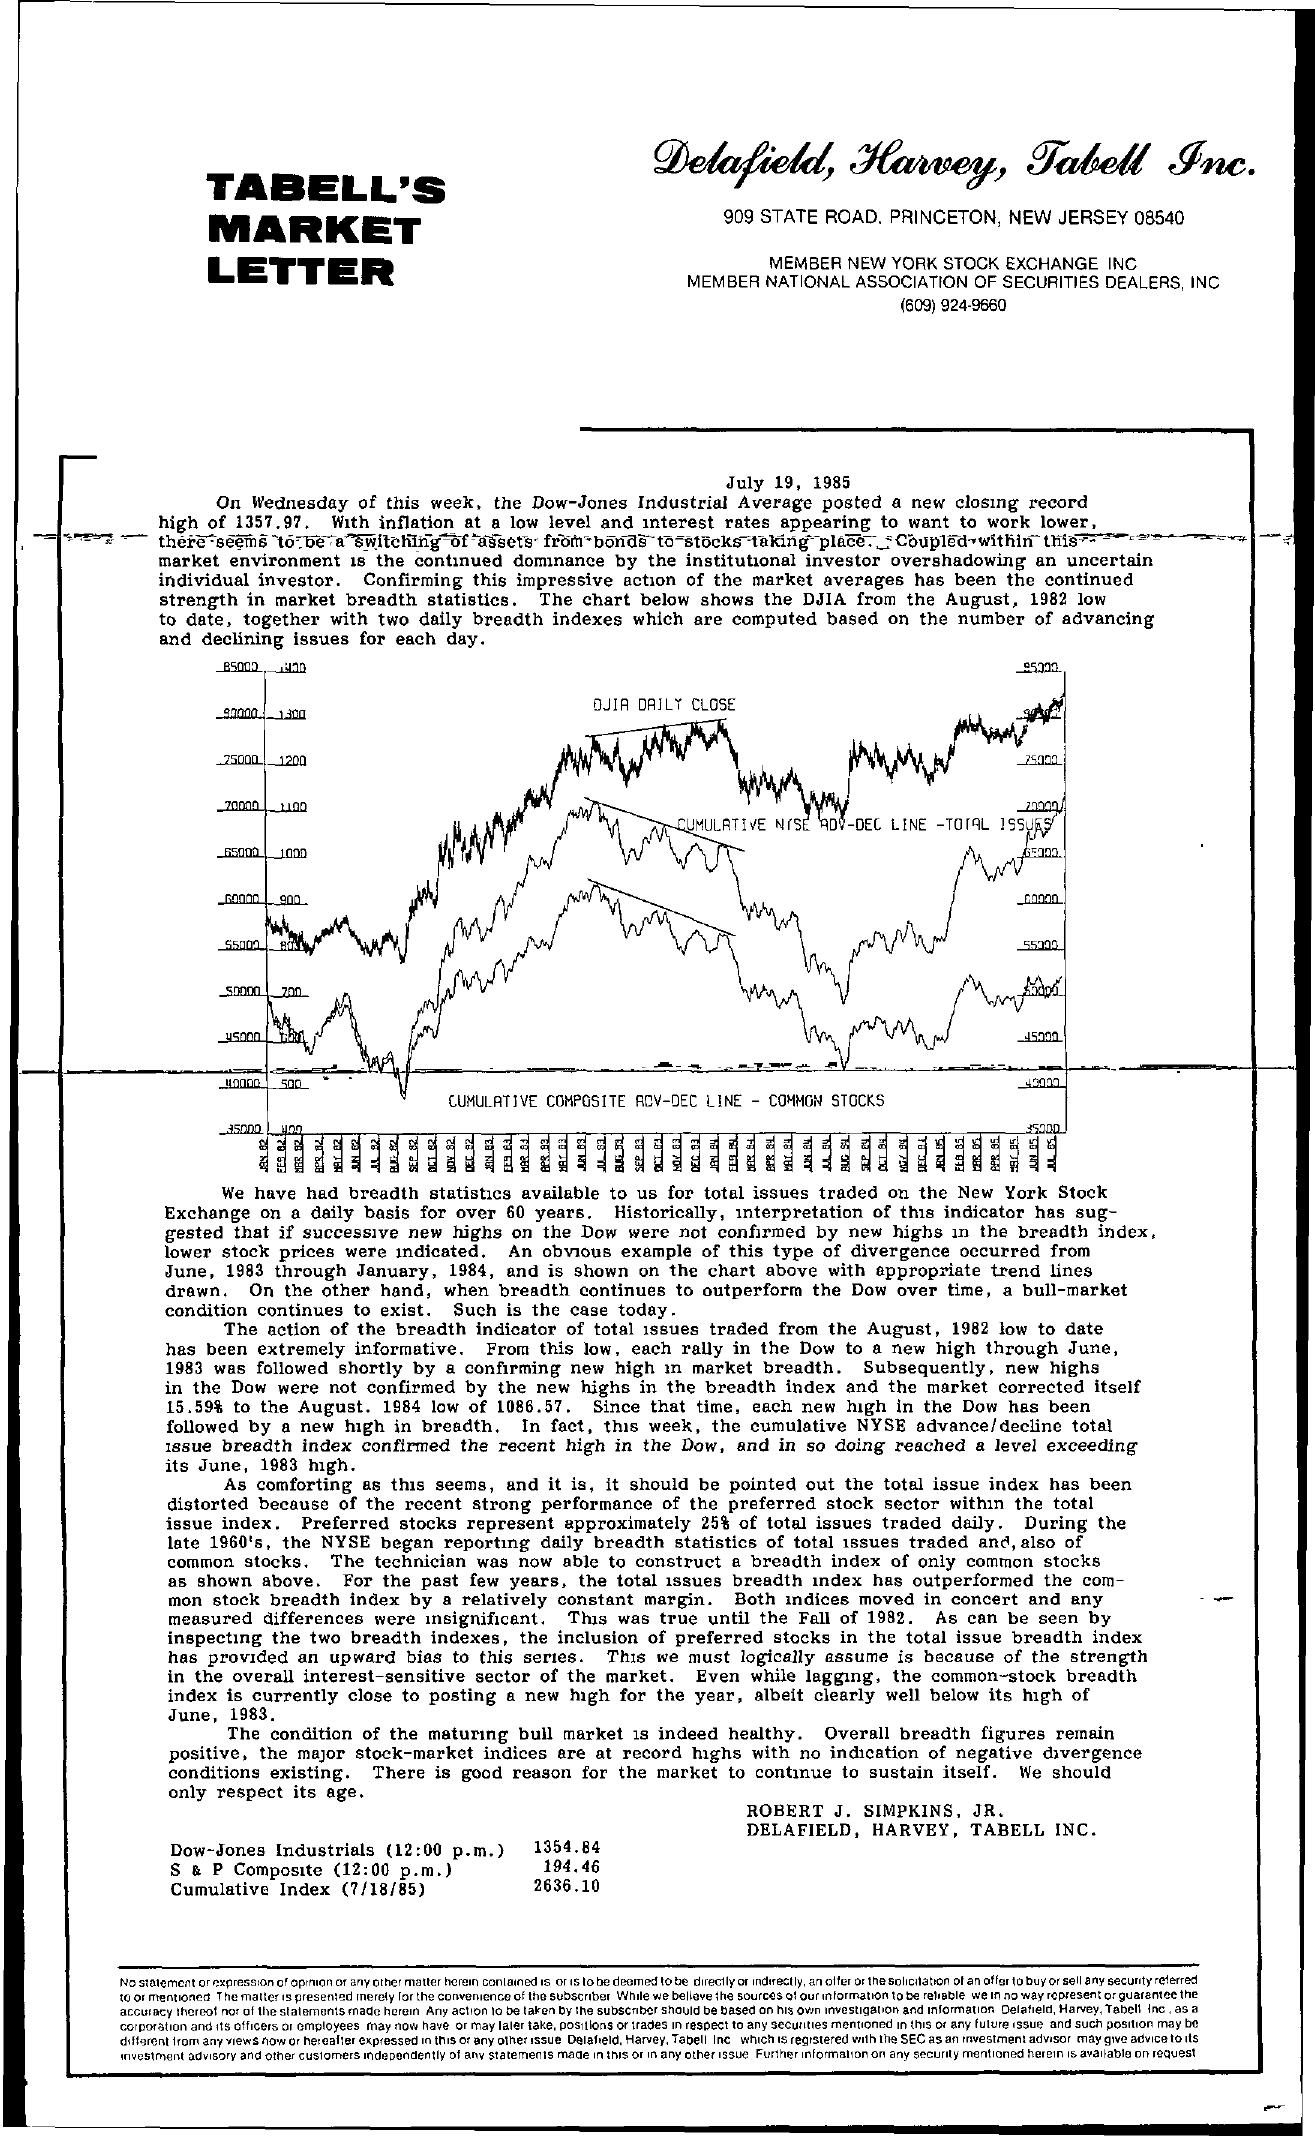 Tabell's Market Letter - July 19, 1985